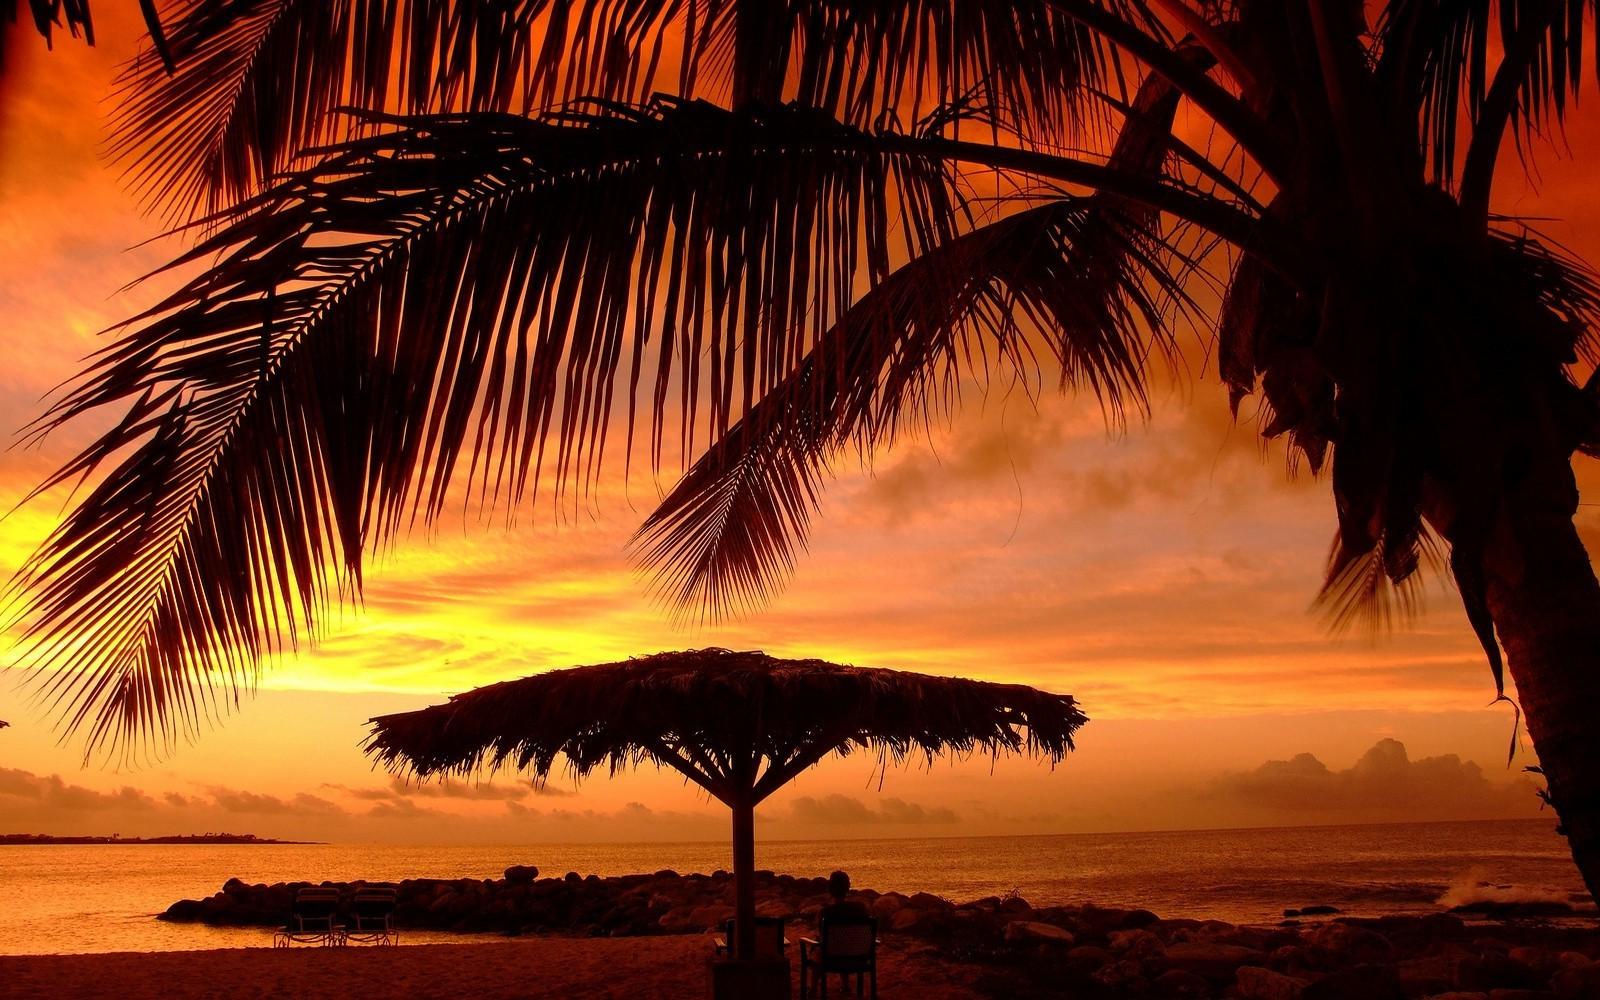 Sunlight Landscape Sunset Sea Nature Sky Clouds Beach Umbrella Sunrise Evening Morning Palm Trees Sun Horizon